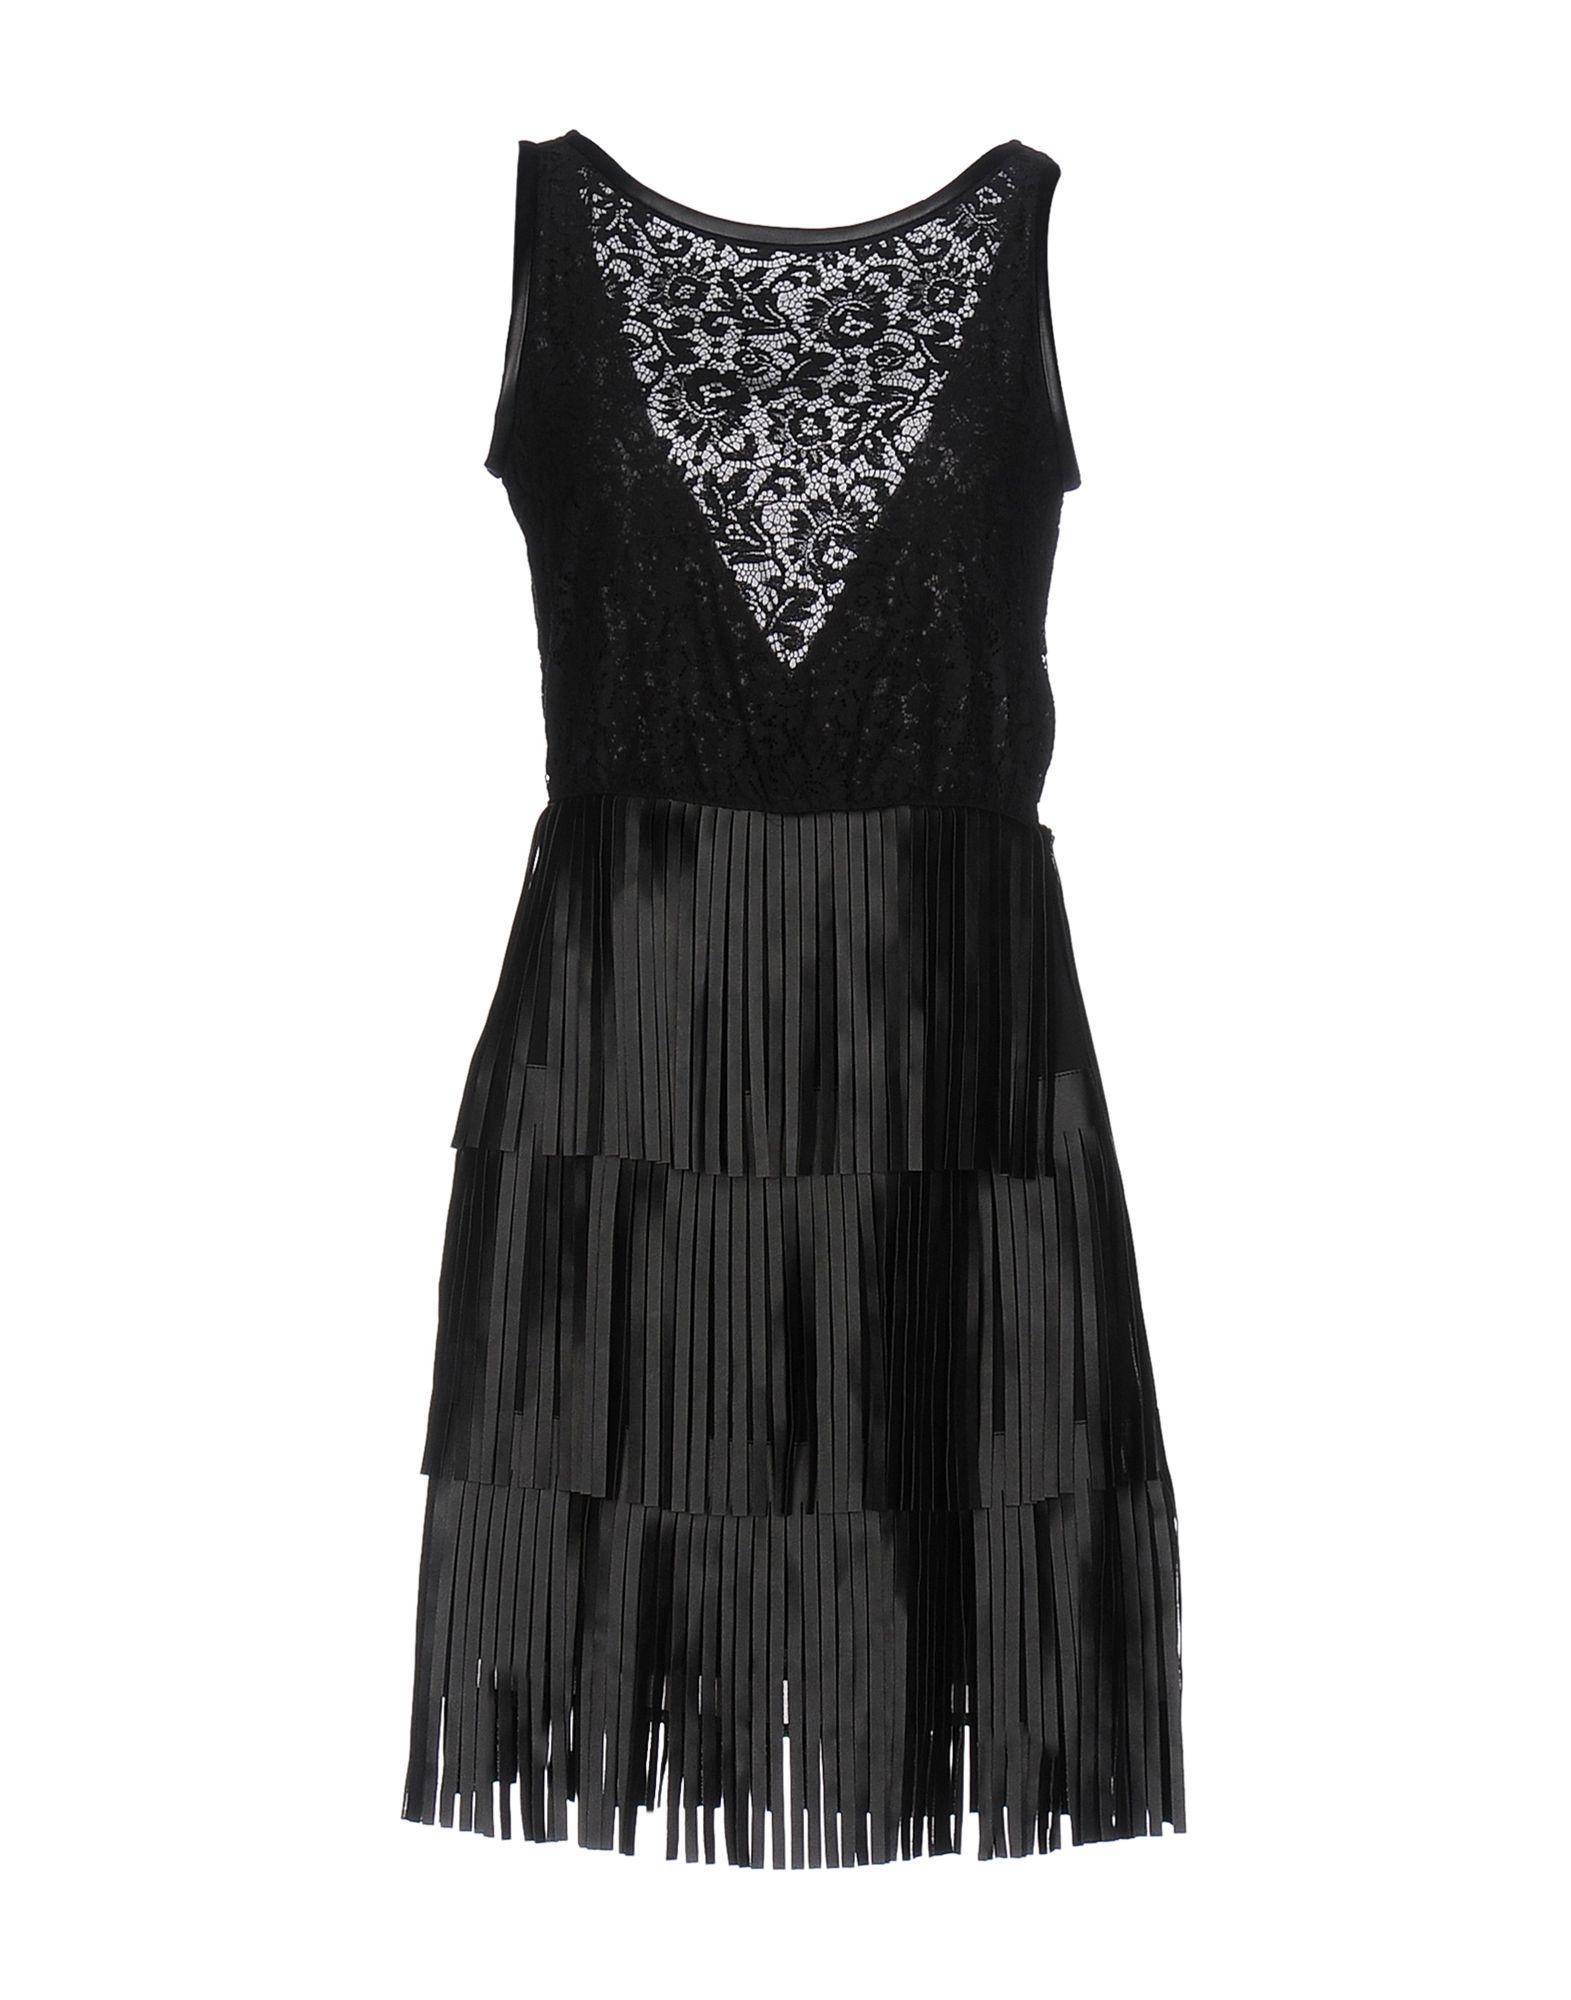 LES COCKTAILS DE LIU •JO Damen Kurzes Kleid Farbe Schwarz Größe 2